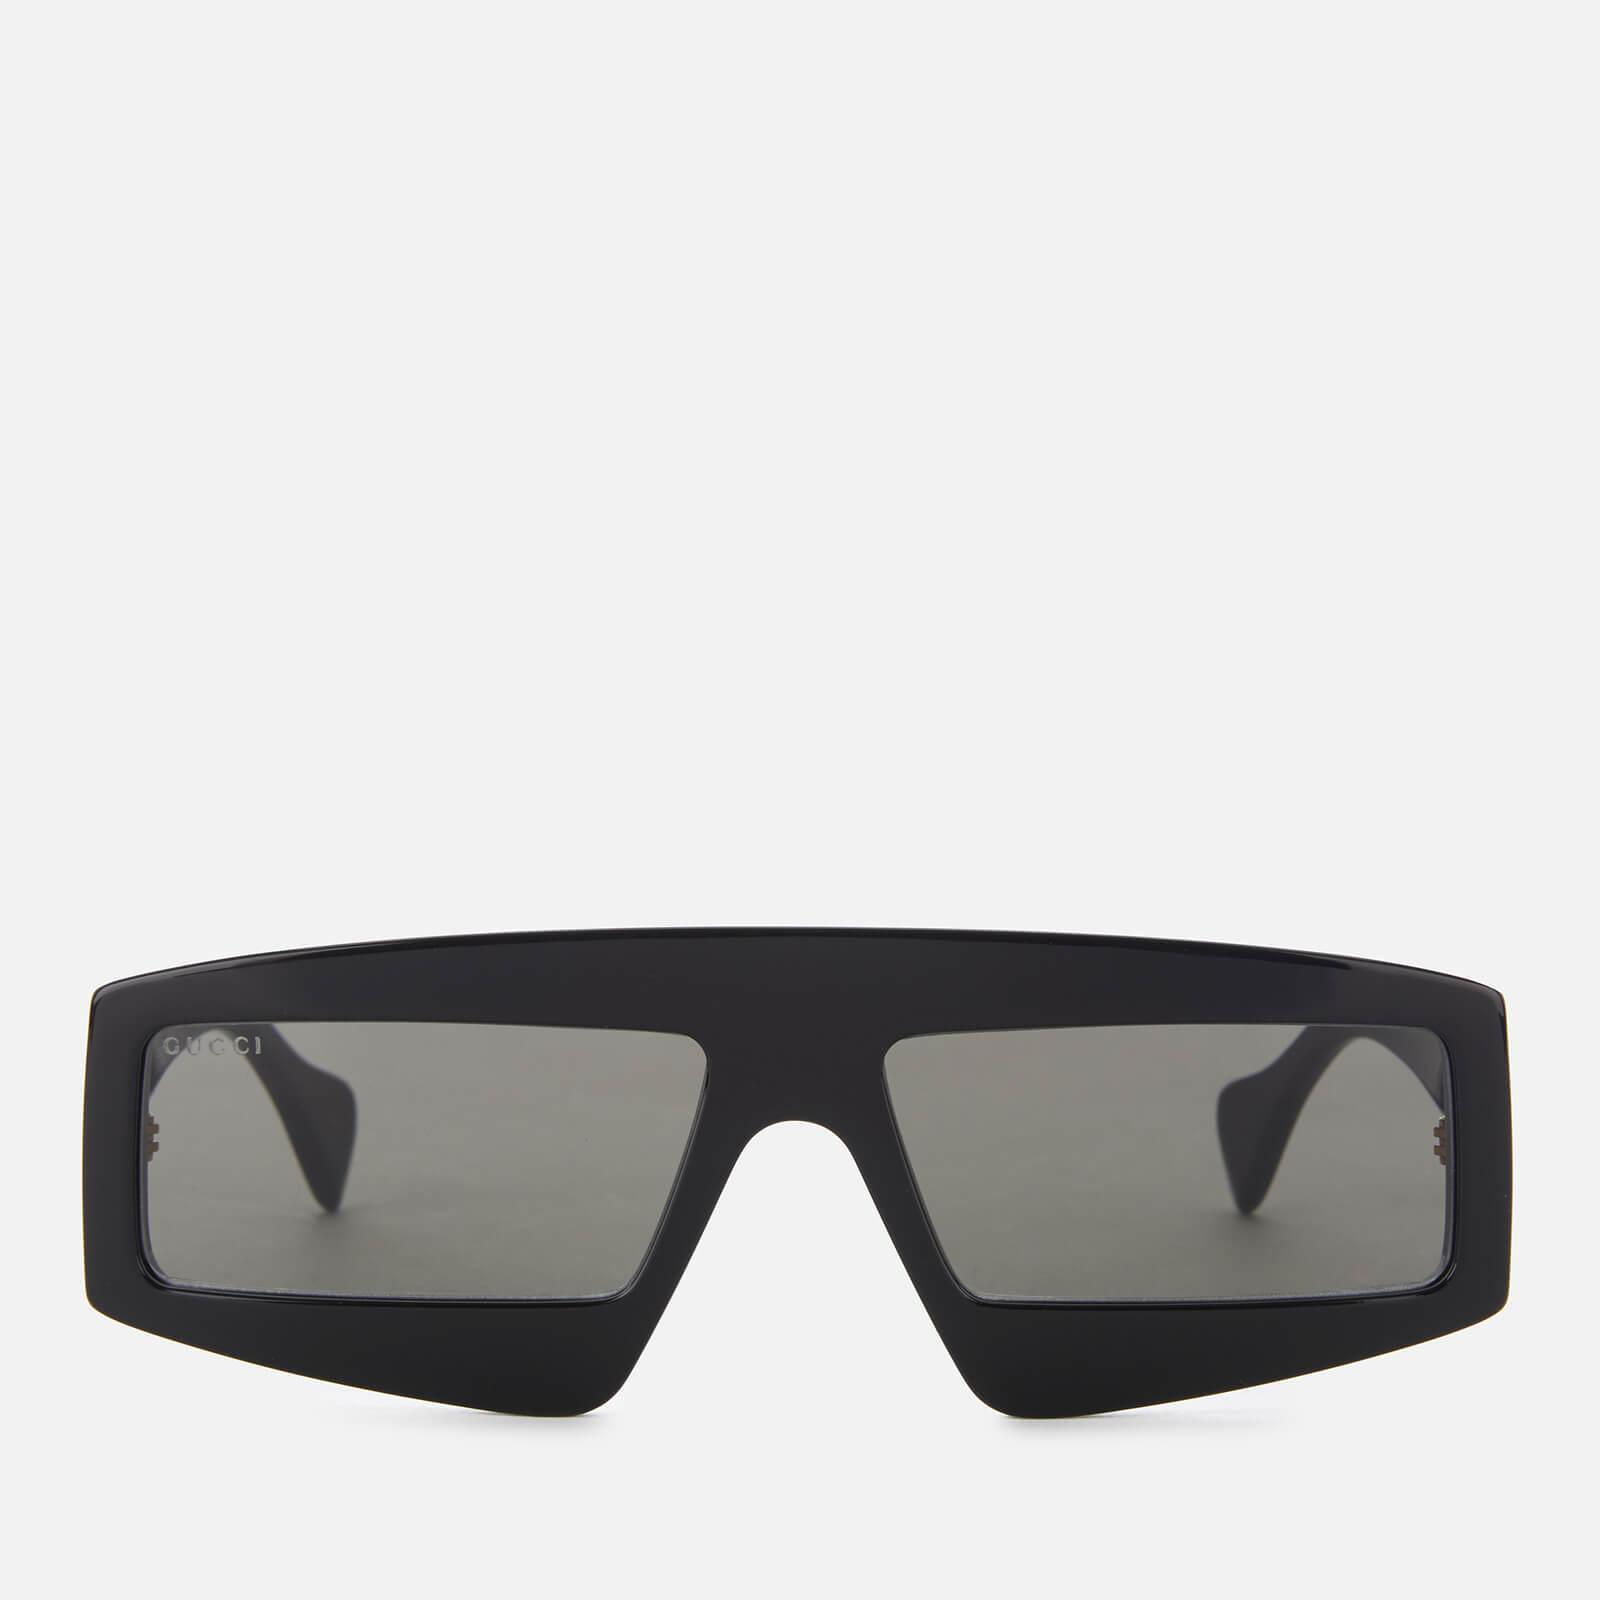 546b079977c Gucci - Black Acetate Sunglasses - Lyst. View fullscreen